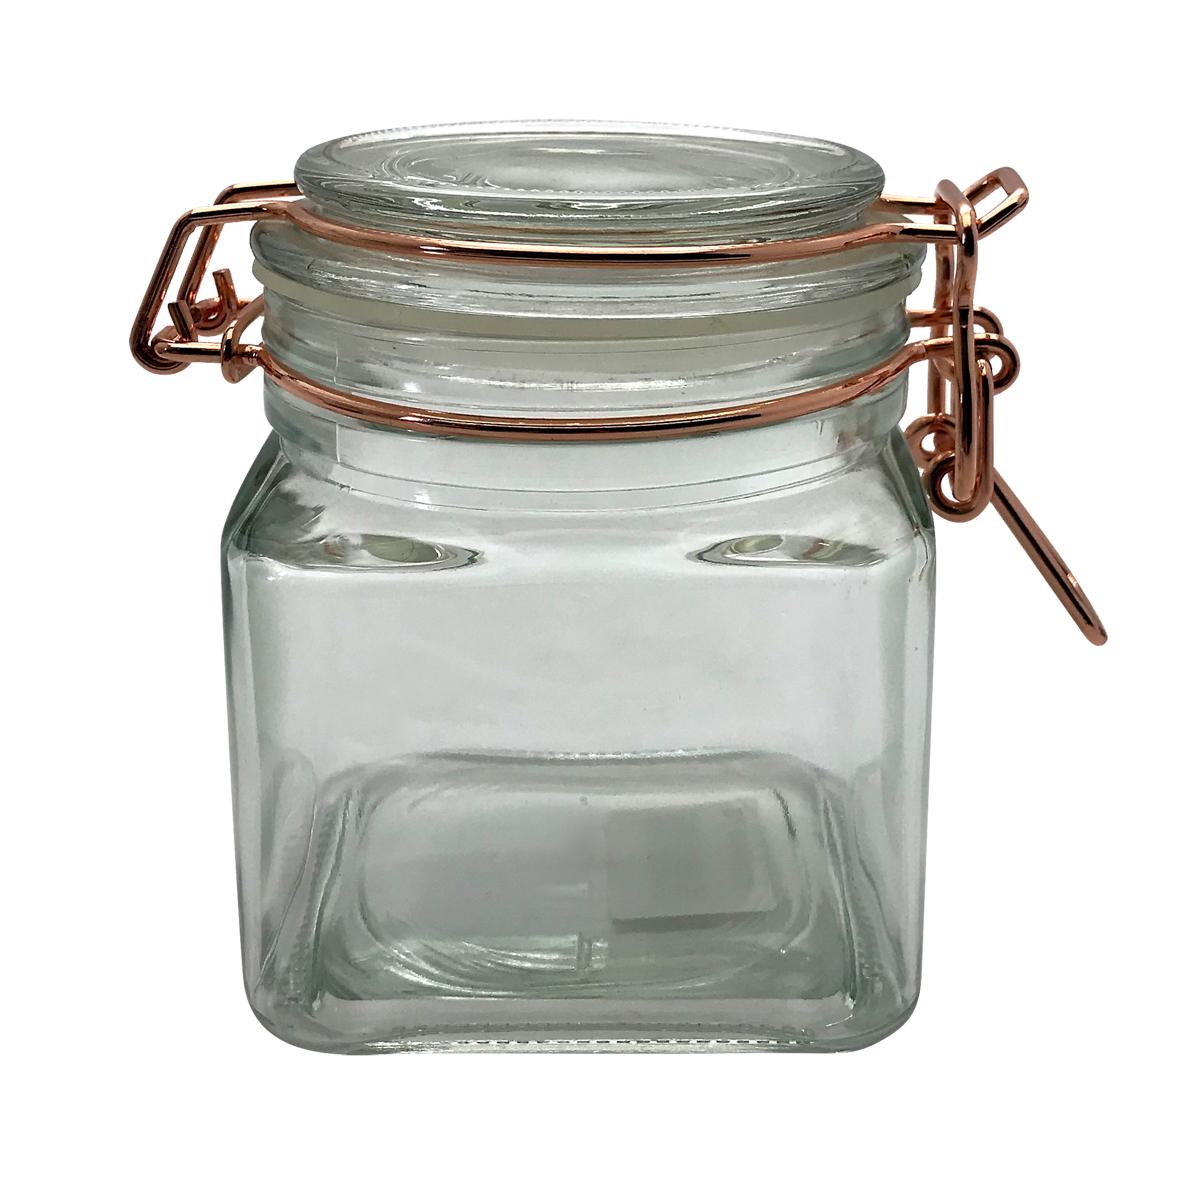 Flip Quadrado - Pote Hermético de Vidro  Borossilicato 360 ml